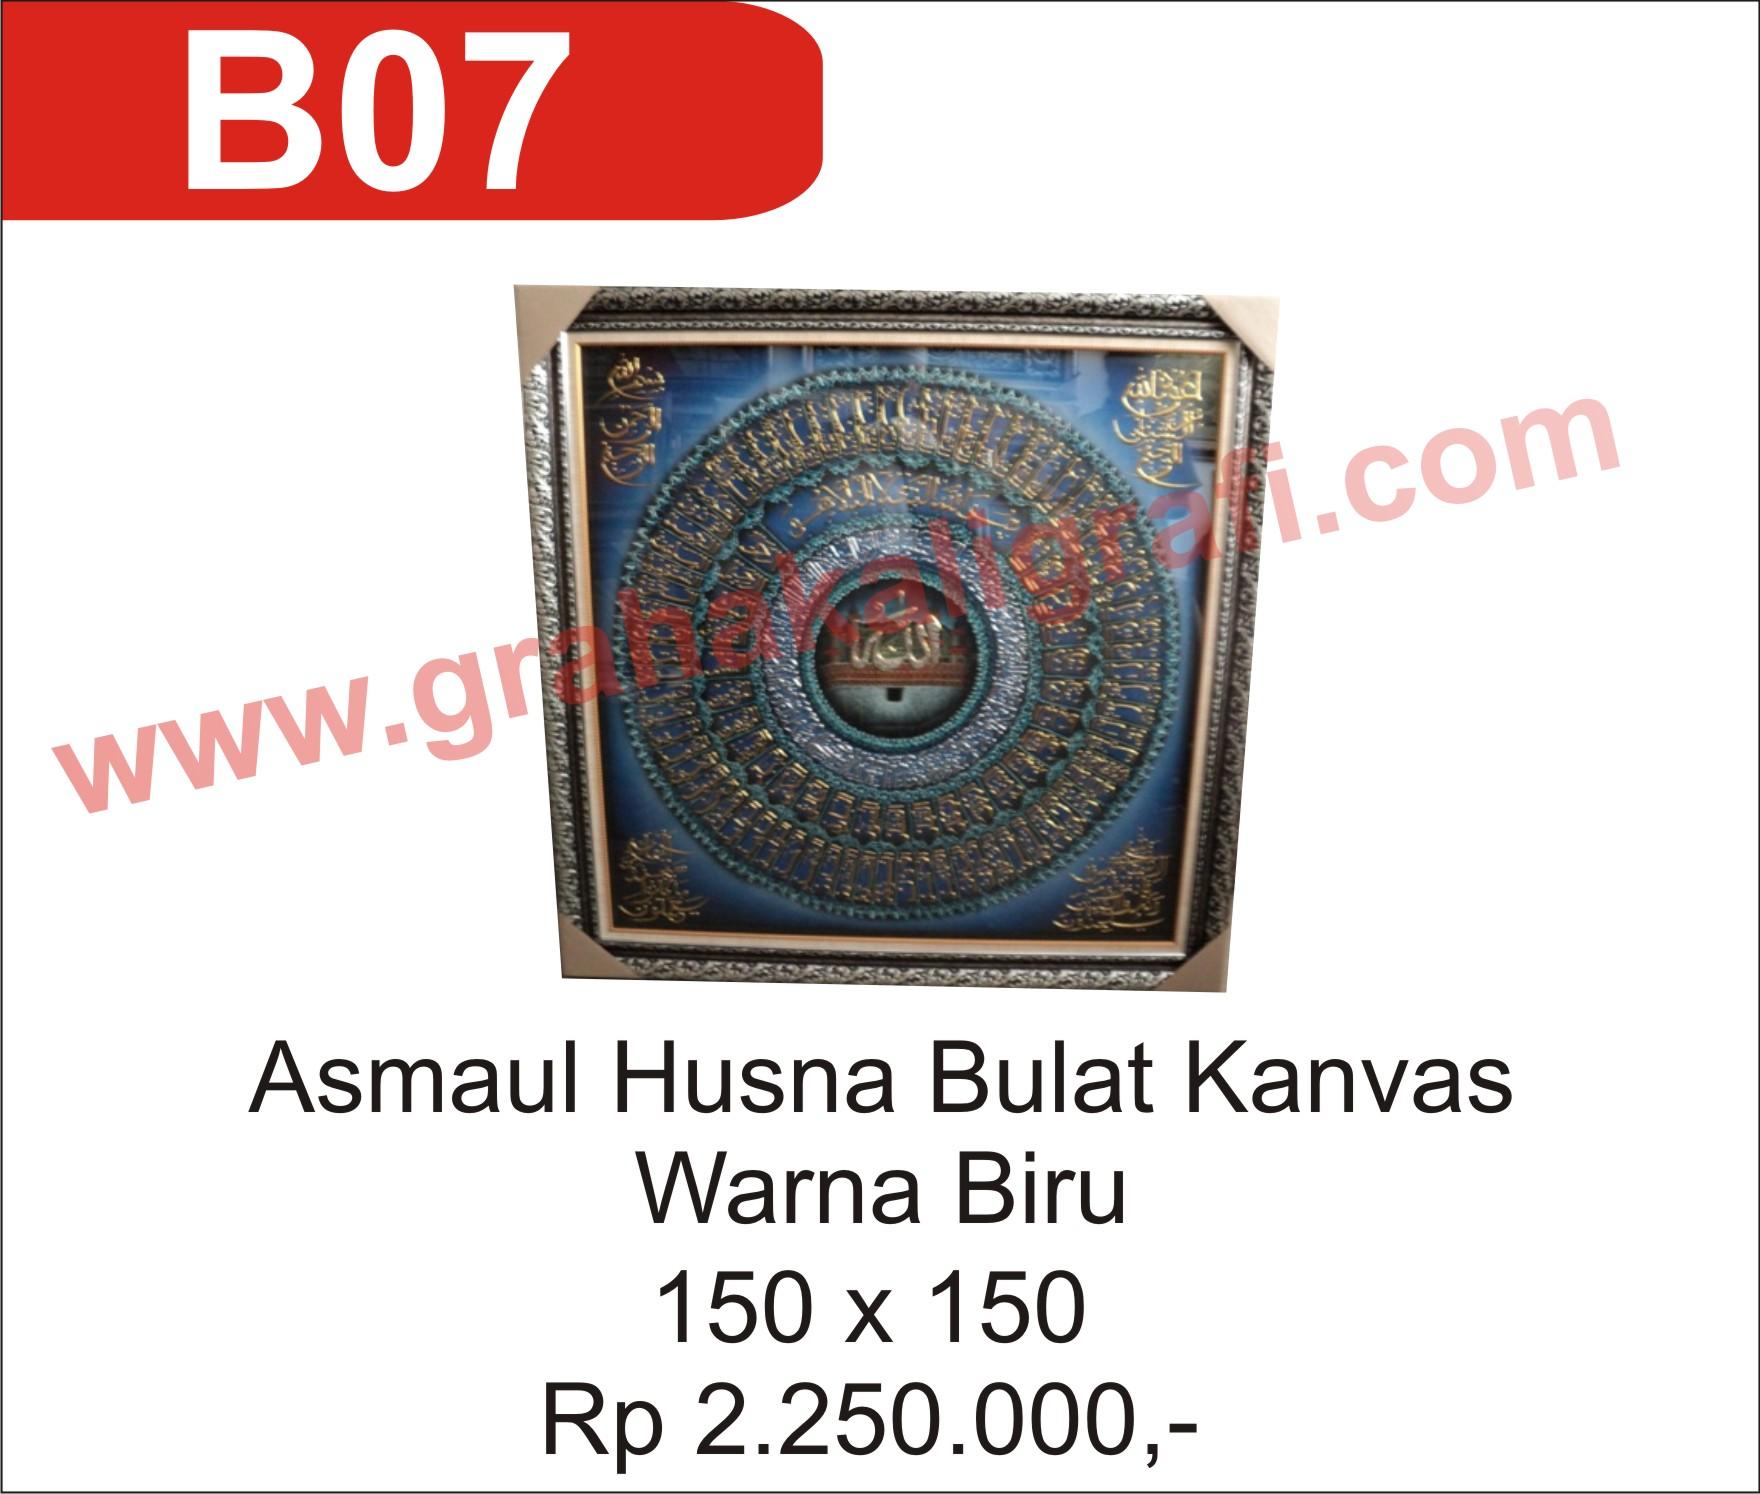 b07-asmaul-husna-bulat-kanvas-warna-biru-graha-kaligrafi-e28093 ...